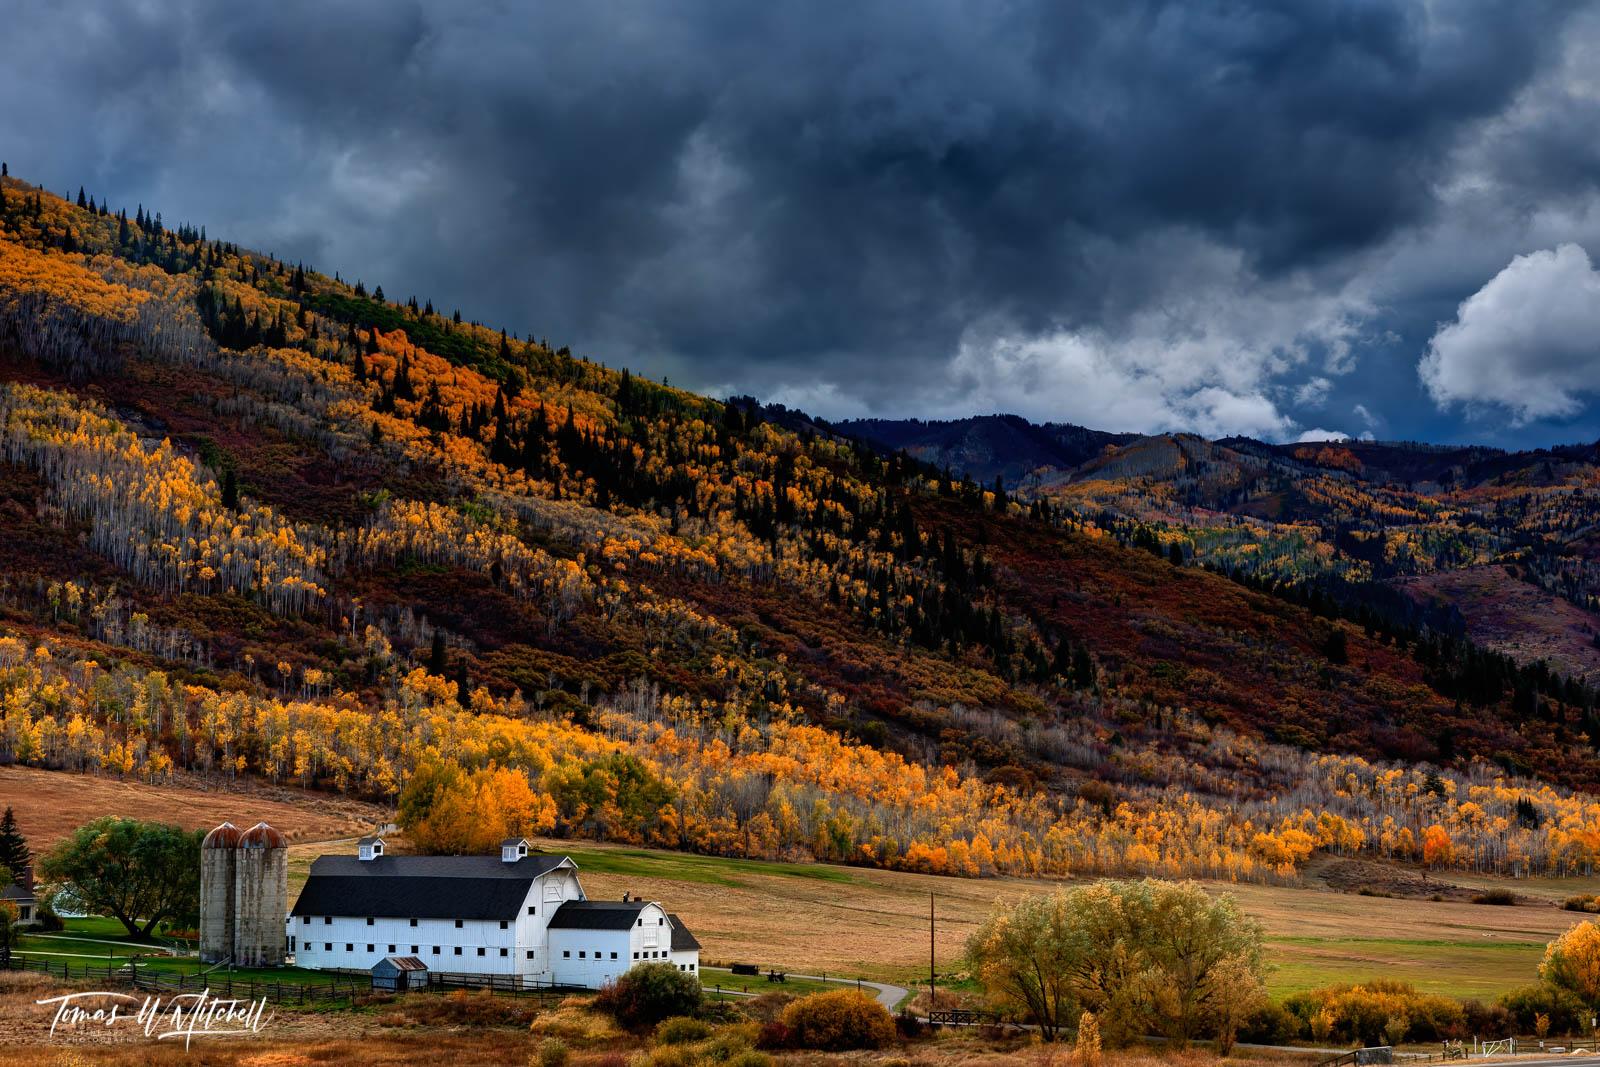 limited edition, autumn, storm, mcpolin farm, fall colors, aspen trees, yellow, orange, mountains, photograph, park city, utah, barn, photo